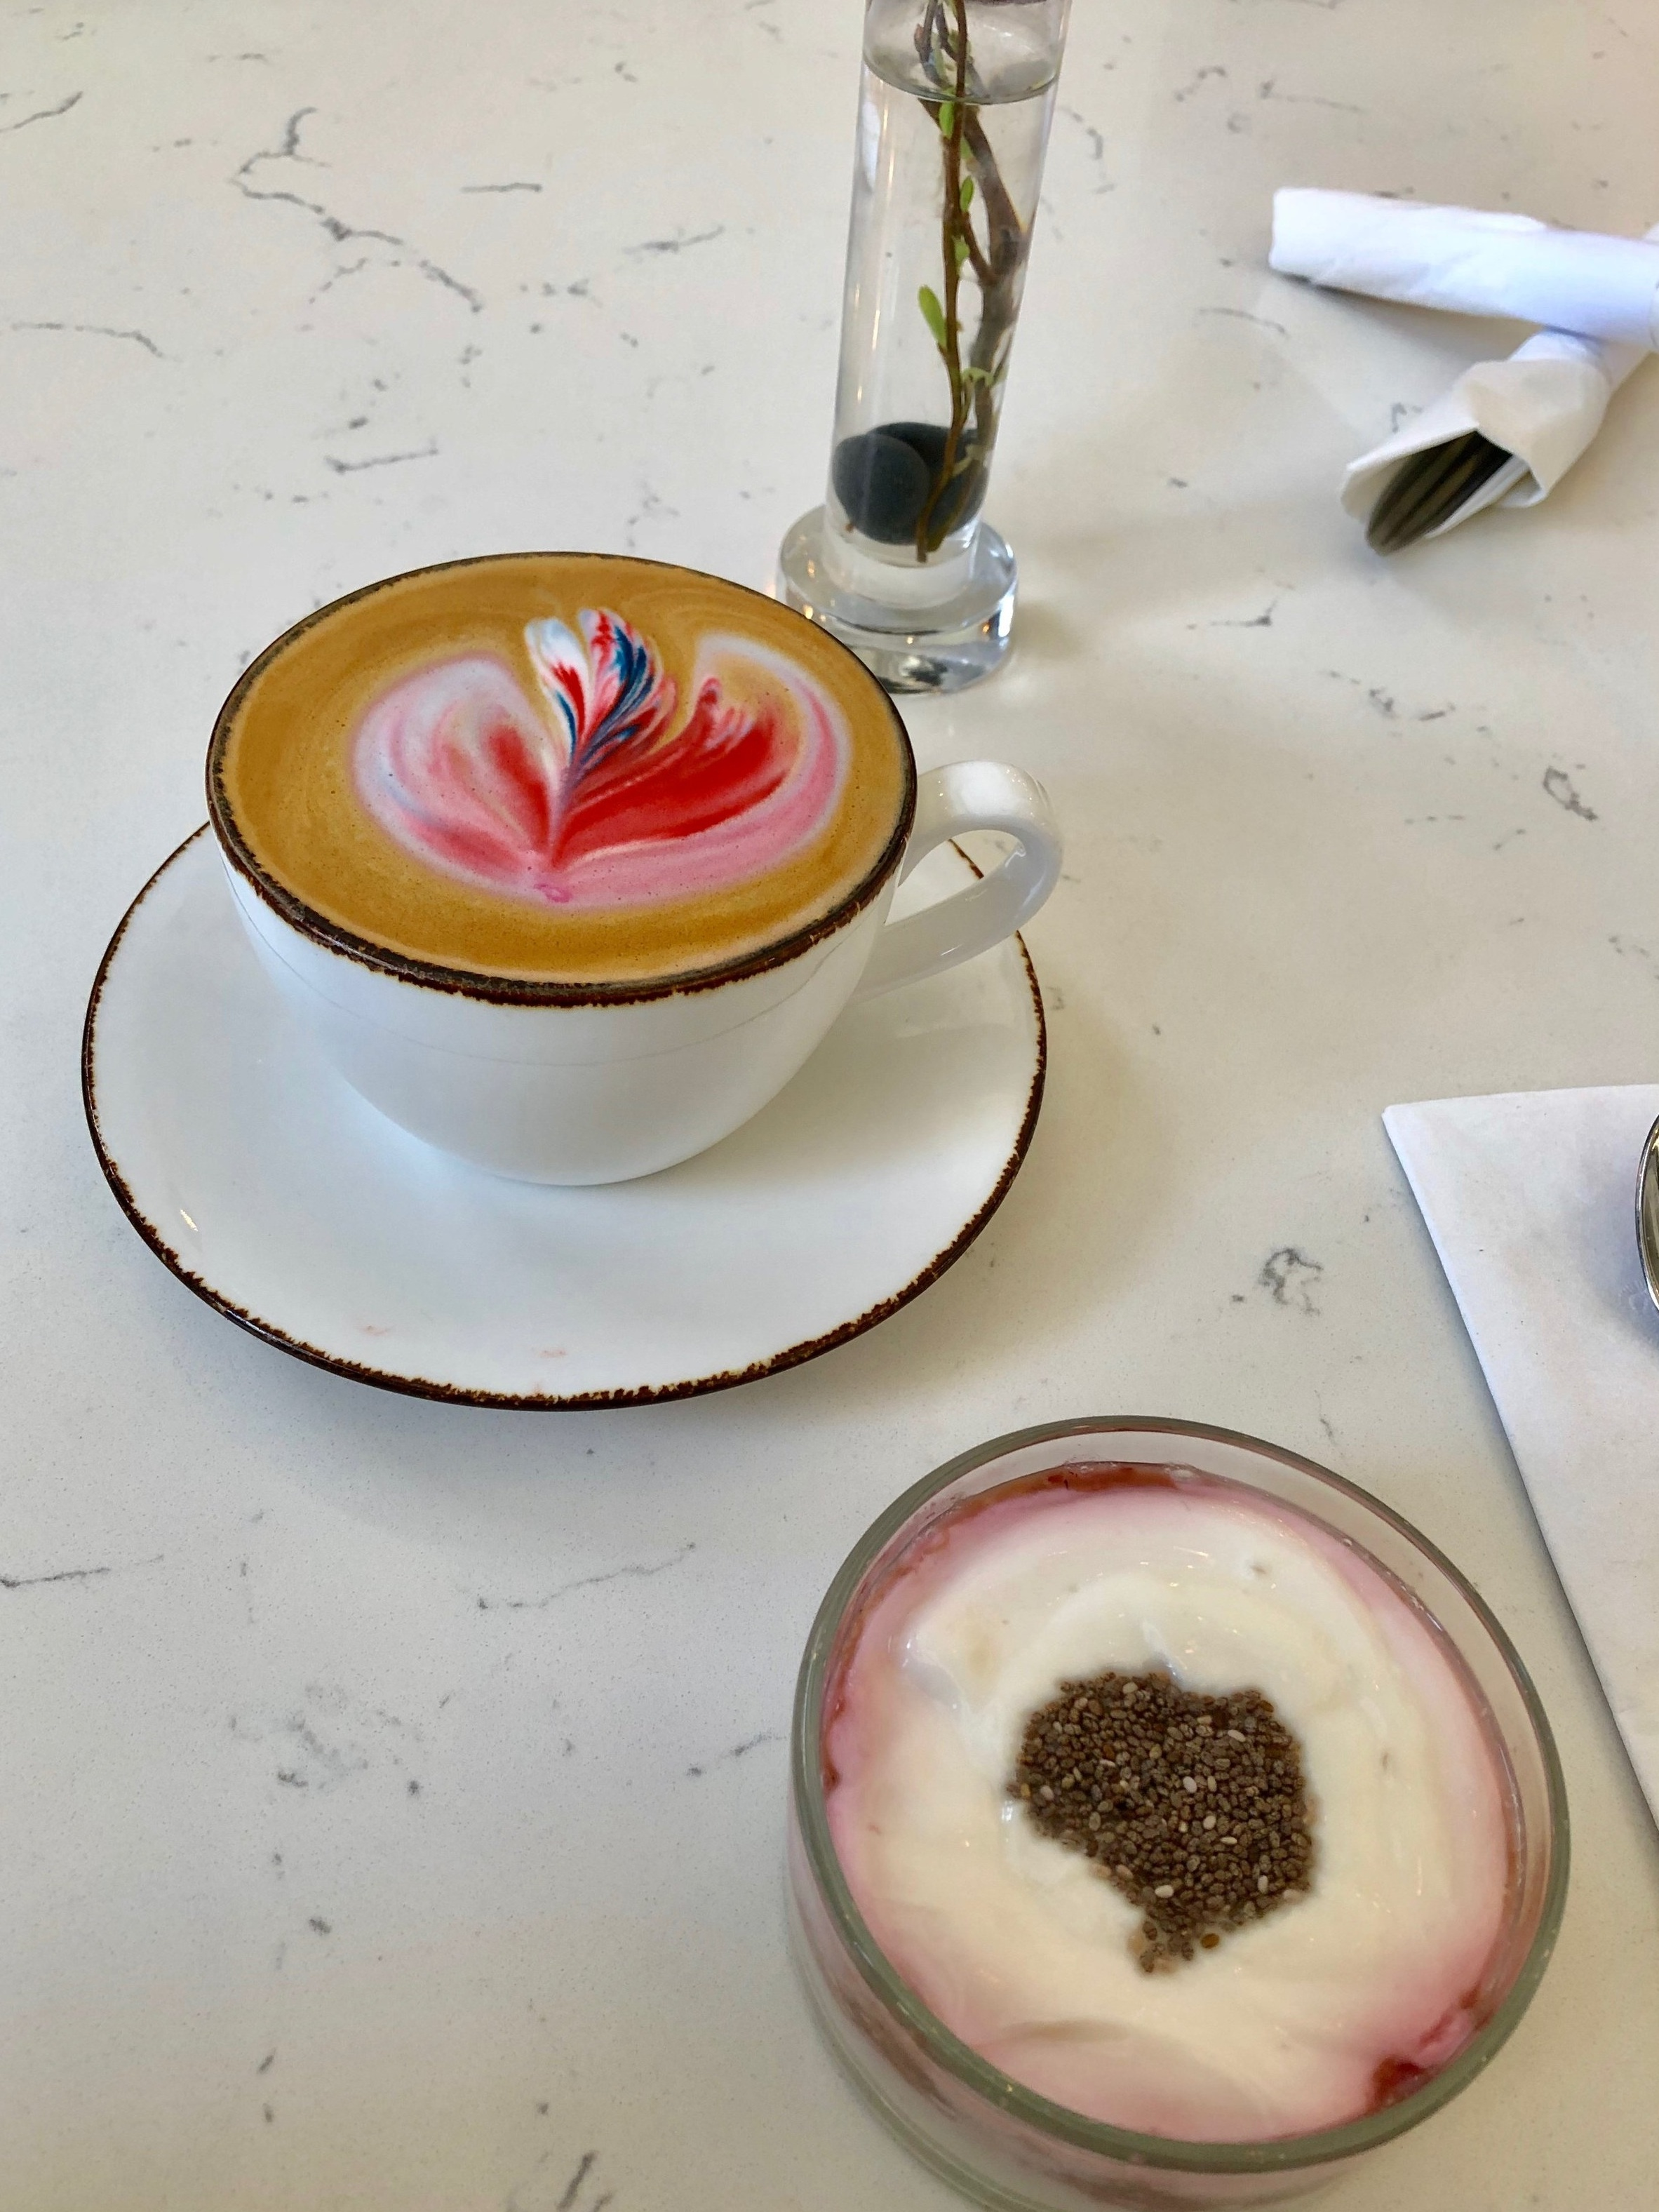 Latte and yogurt parfait at Cafe Fili